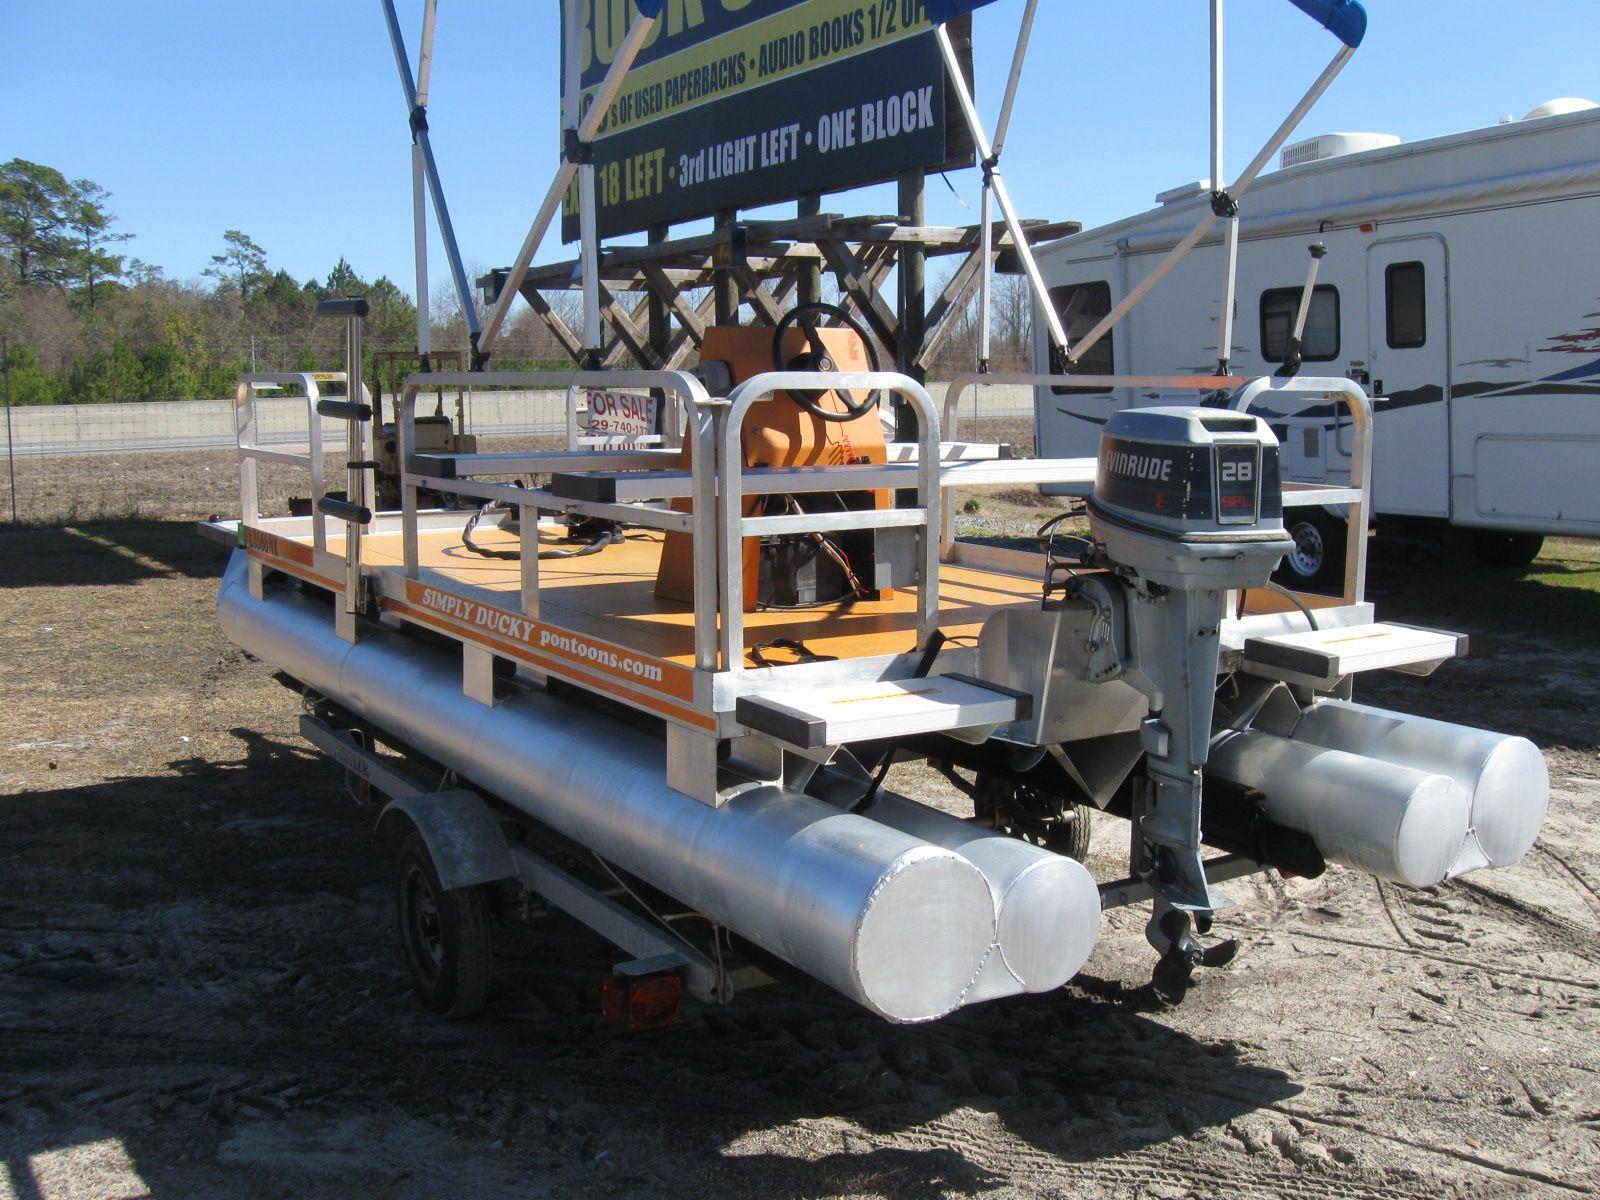 16 Foot Pontoon Boat Re Deck Re Carpet Kits 20 Oz Carpet